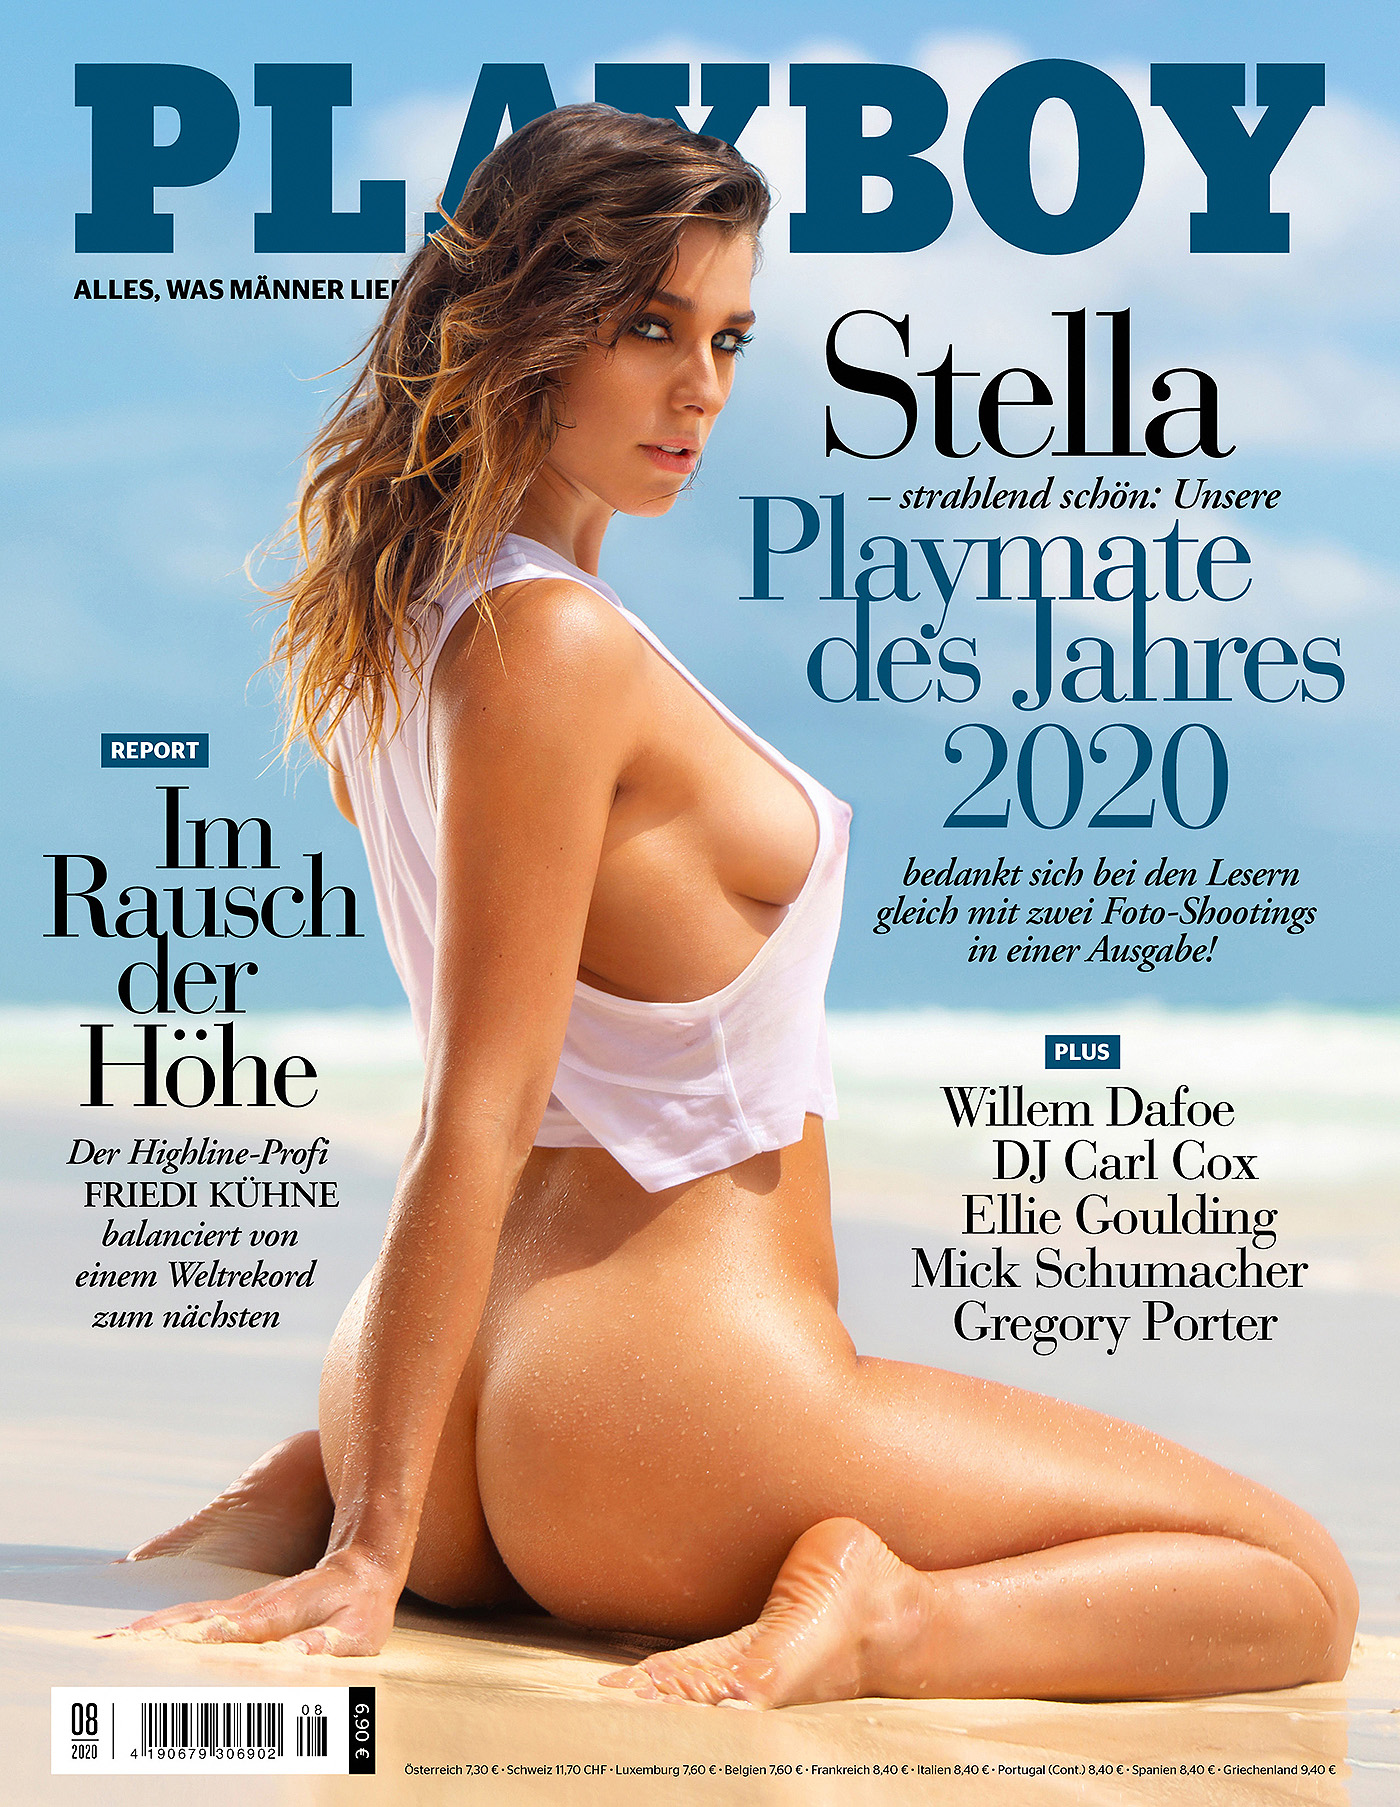 Pmoy 2020 Stella Stegmann by the photographer Ana Dias for Playboy Germany